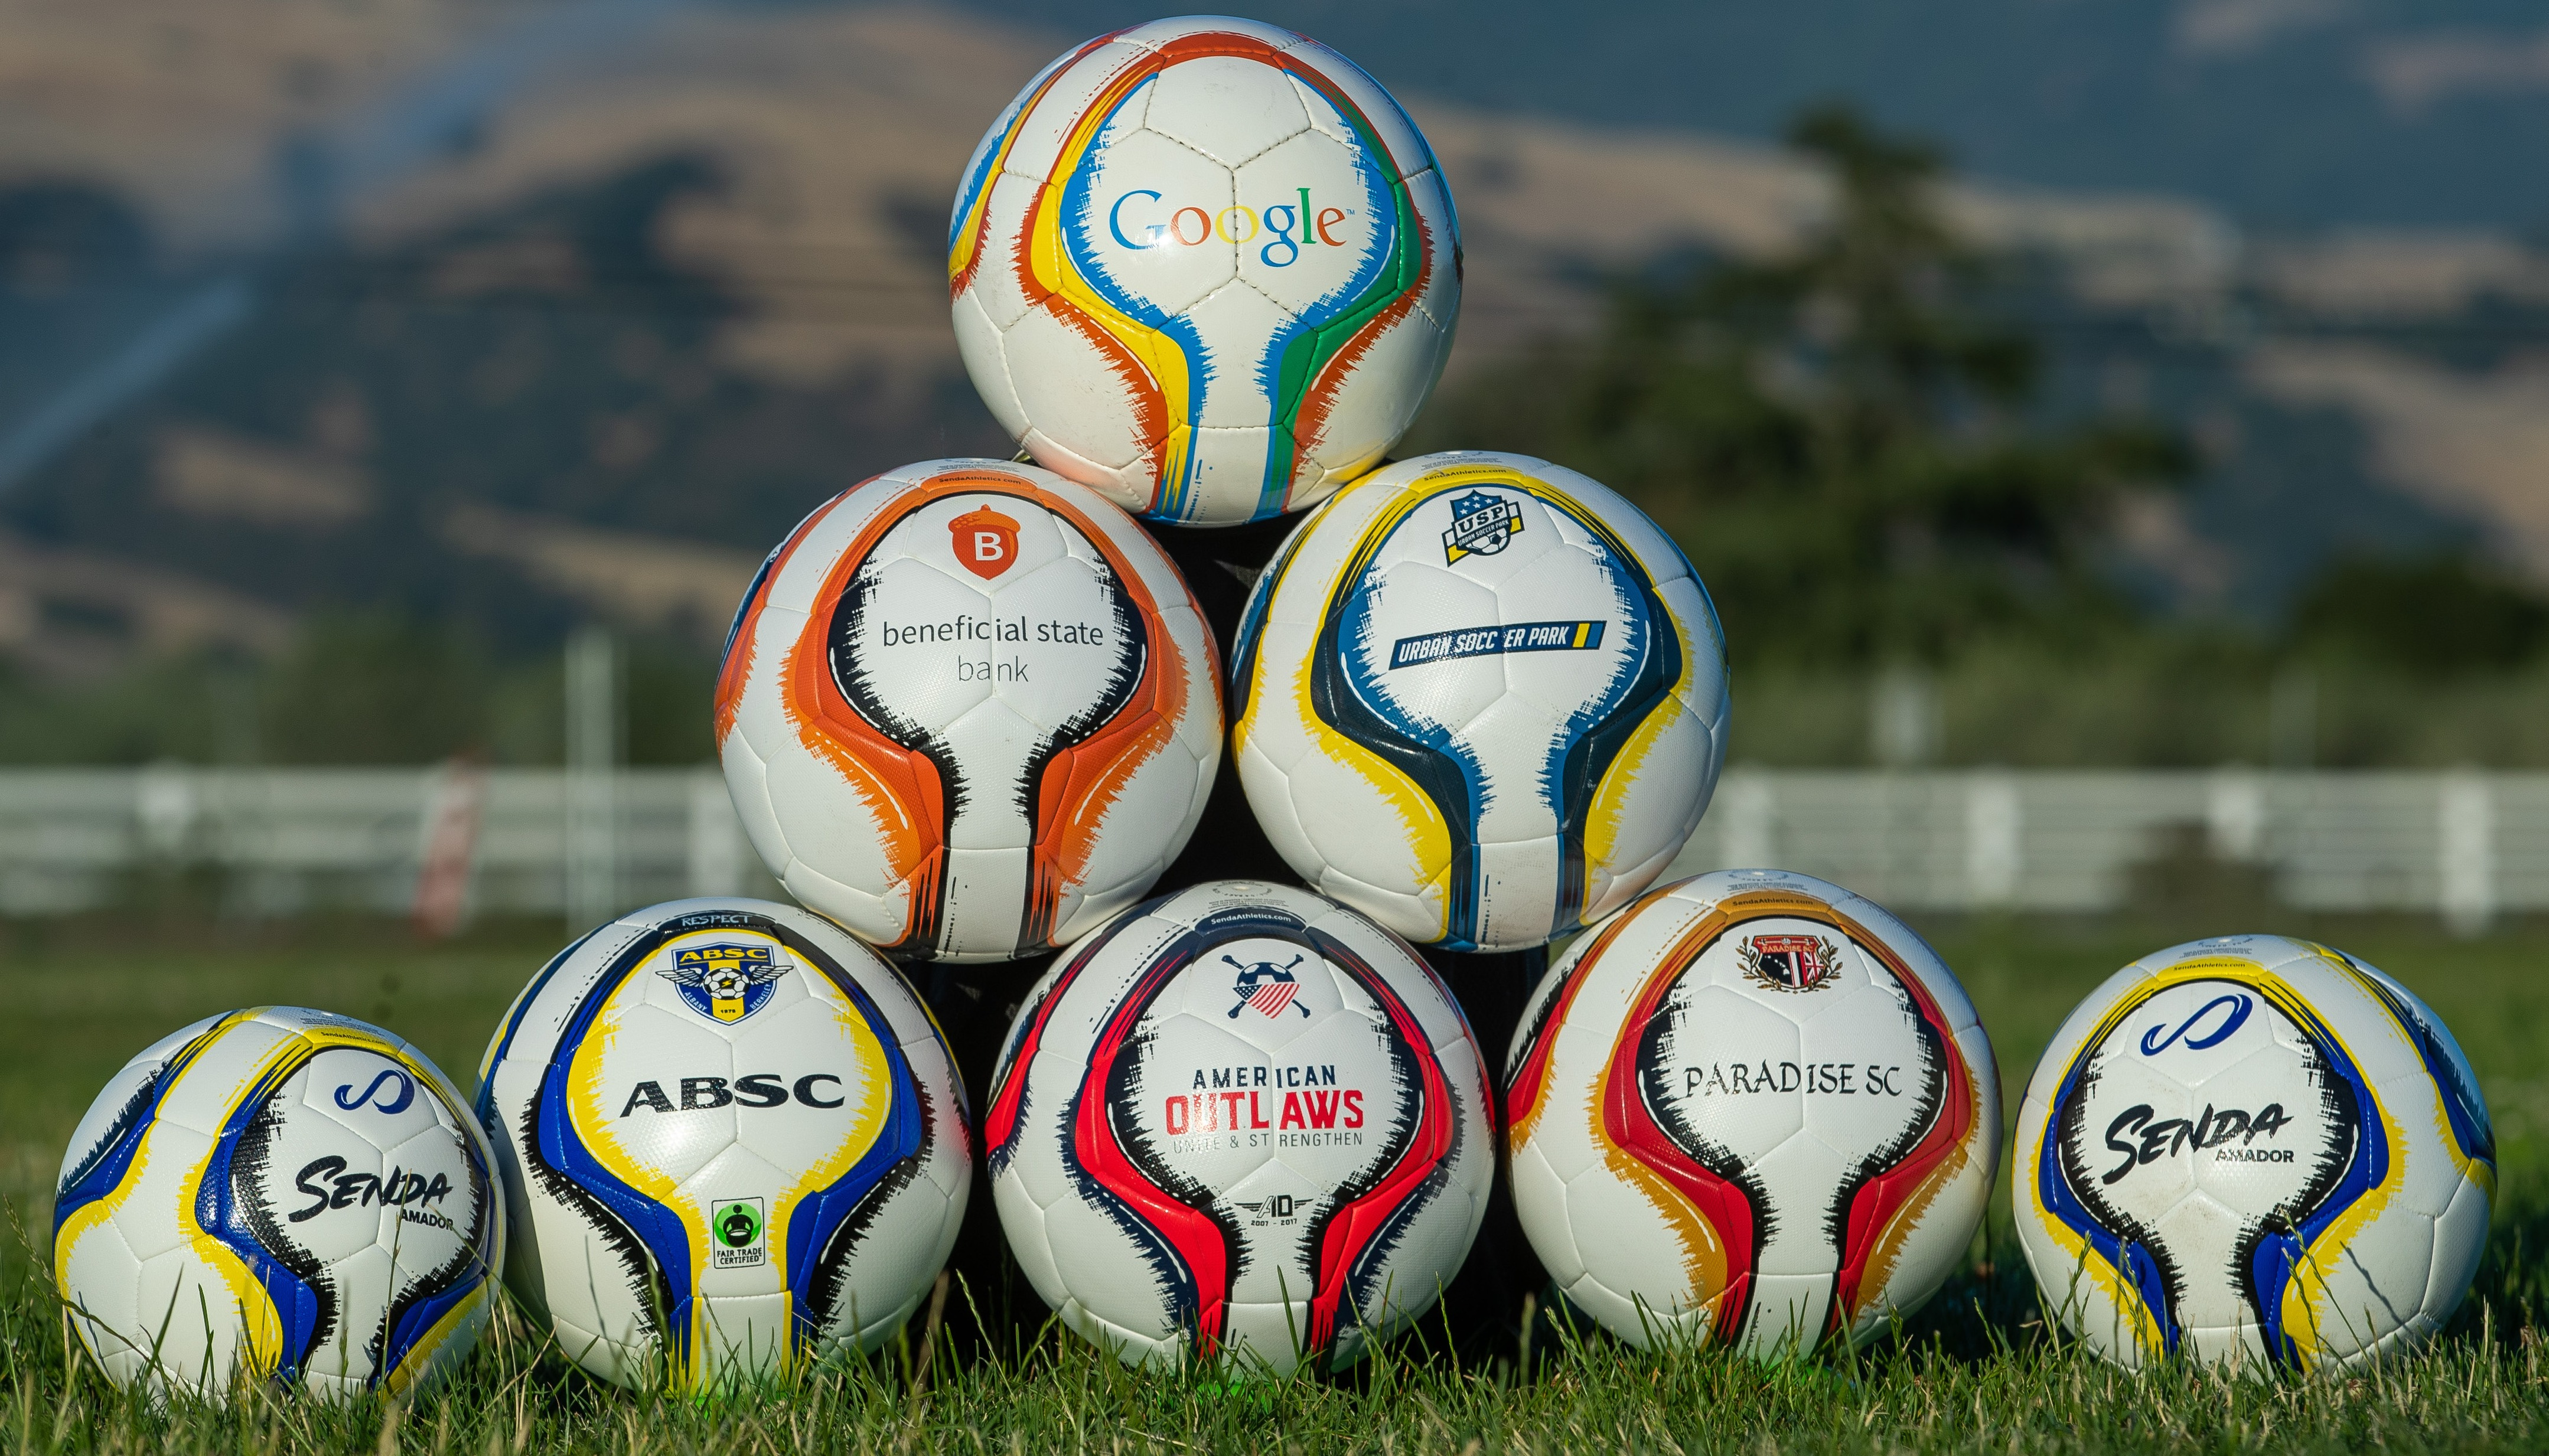 Senda assorted customized balls